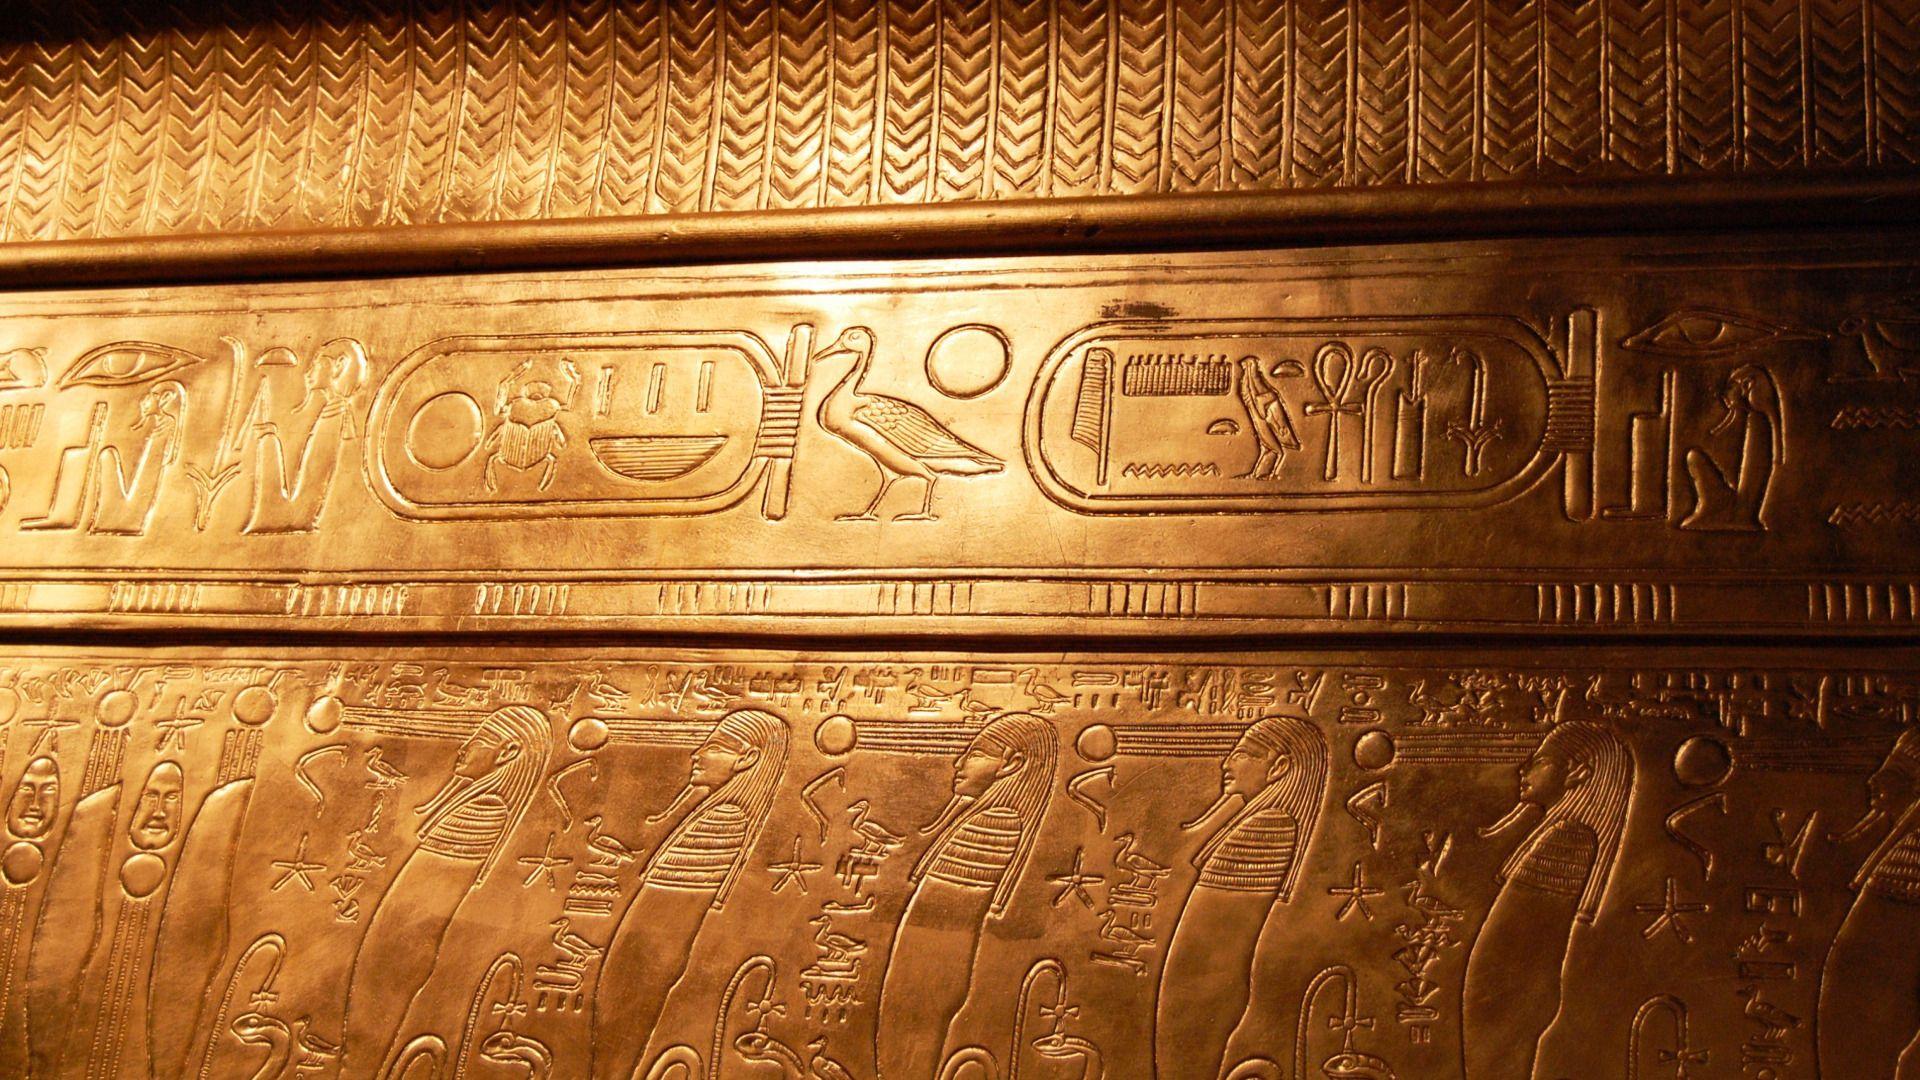 egypt wallpaper hd